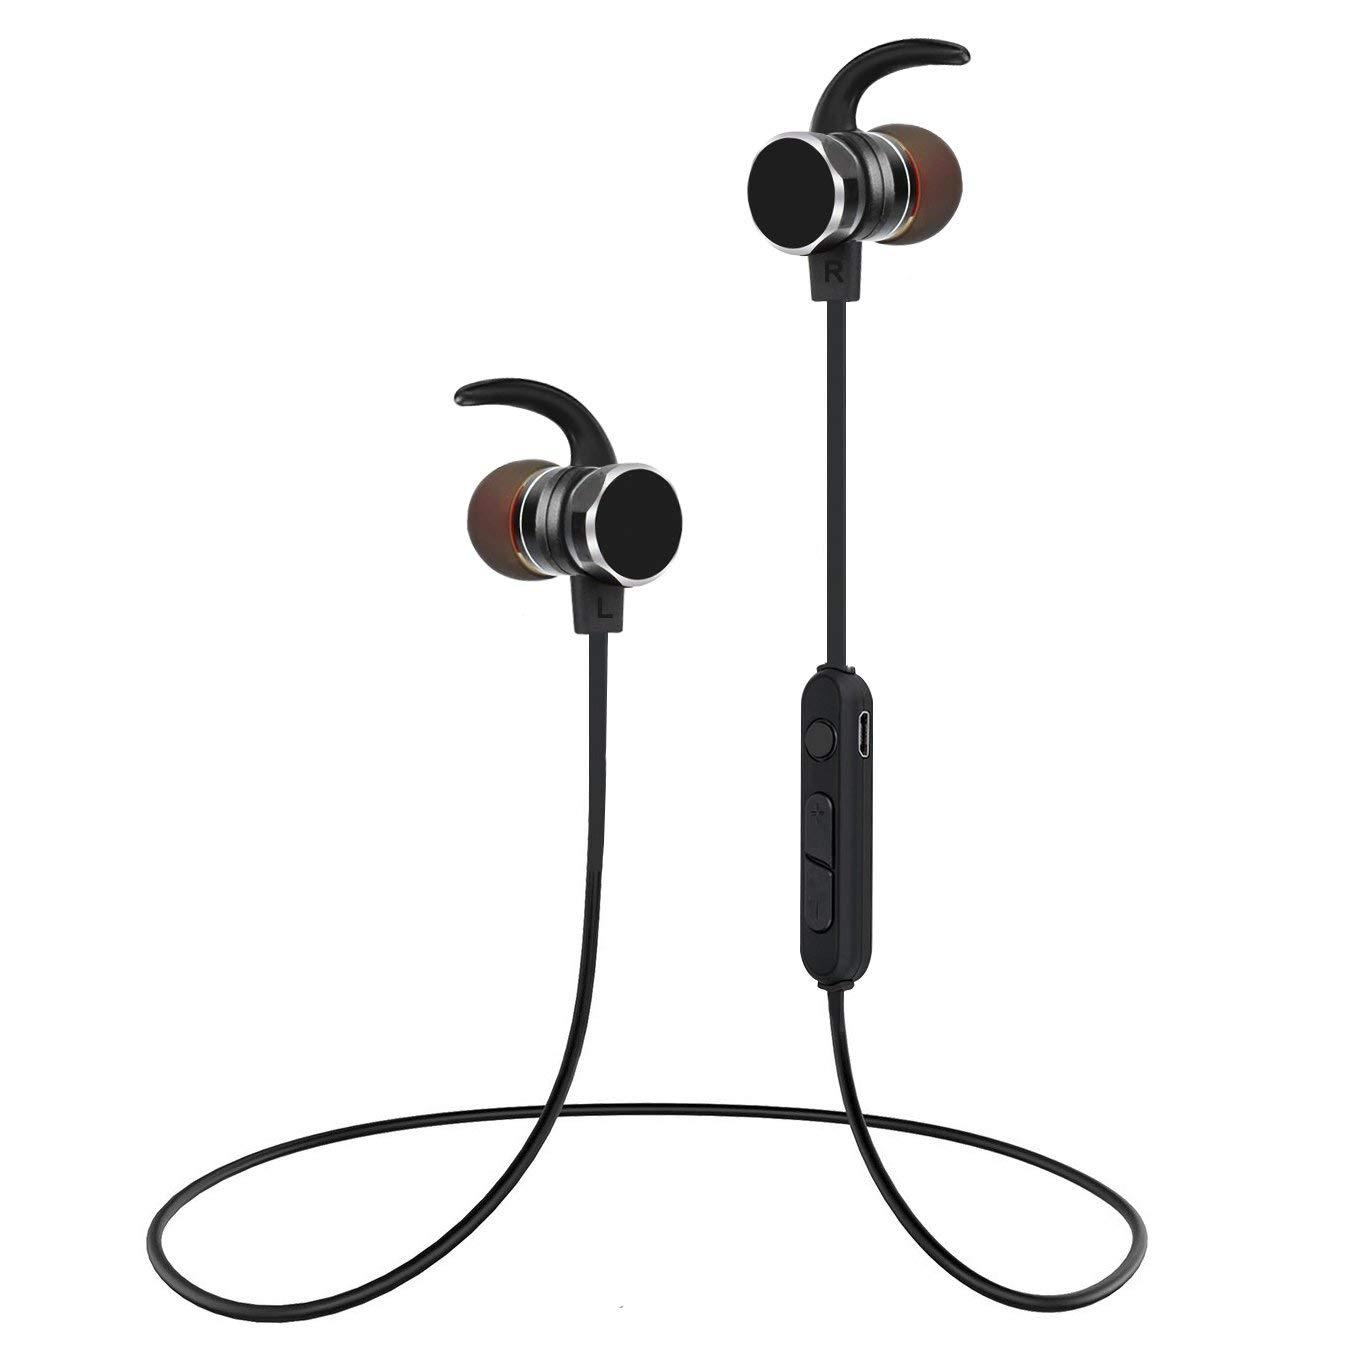 Wireless Sports Earphones, Ucio Wireless Bluetooth Headphones w/Mic IPX5 Waterproof HD Stereo Magnetic Sweatproof Wireless Earbuds for Gym Workout 6 Hour Battery Wireless Headsets